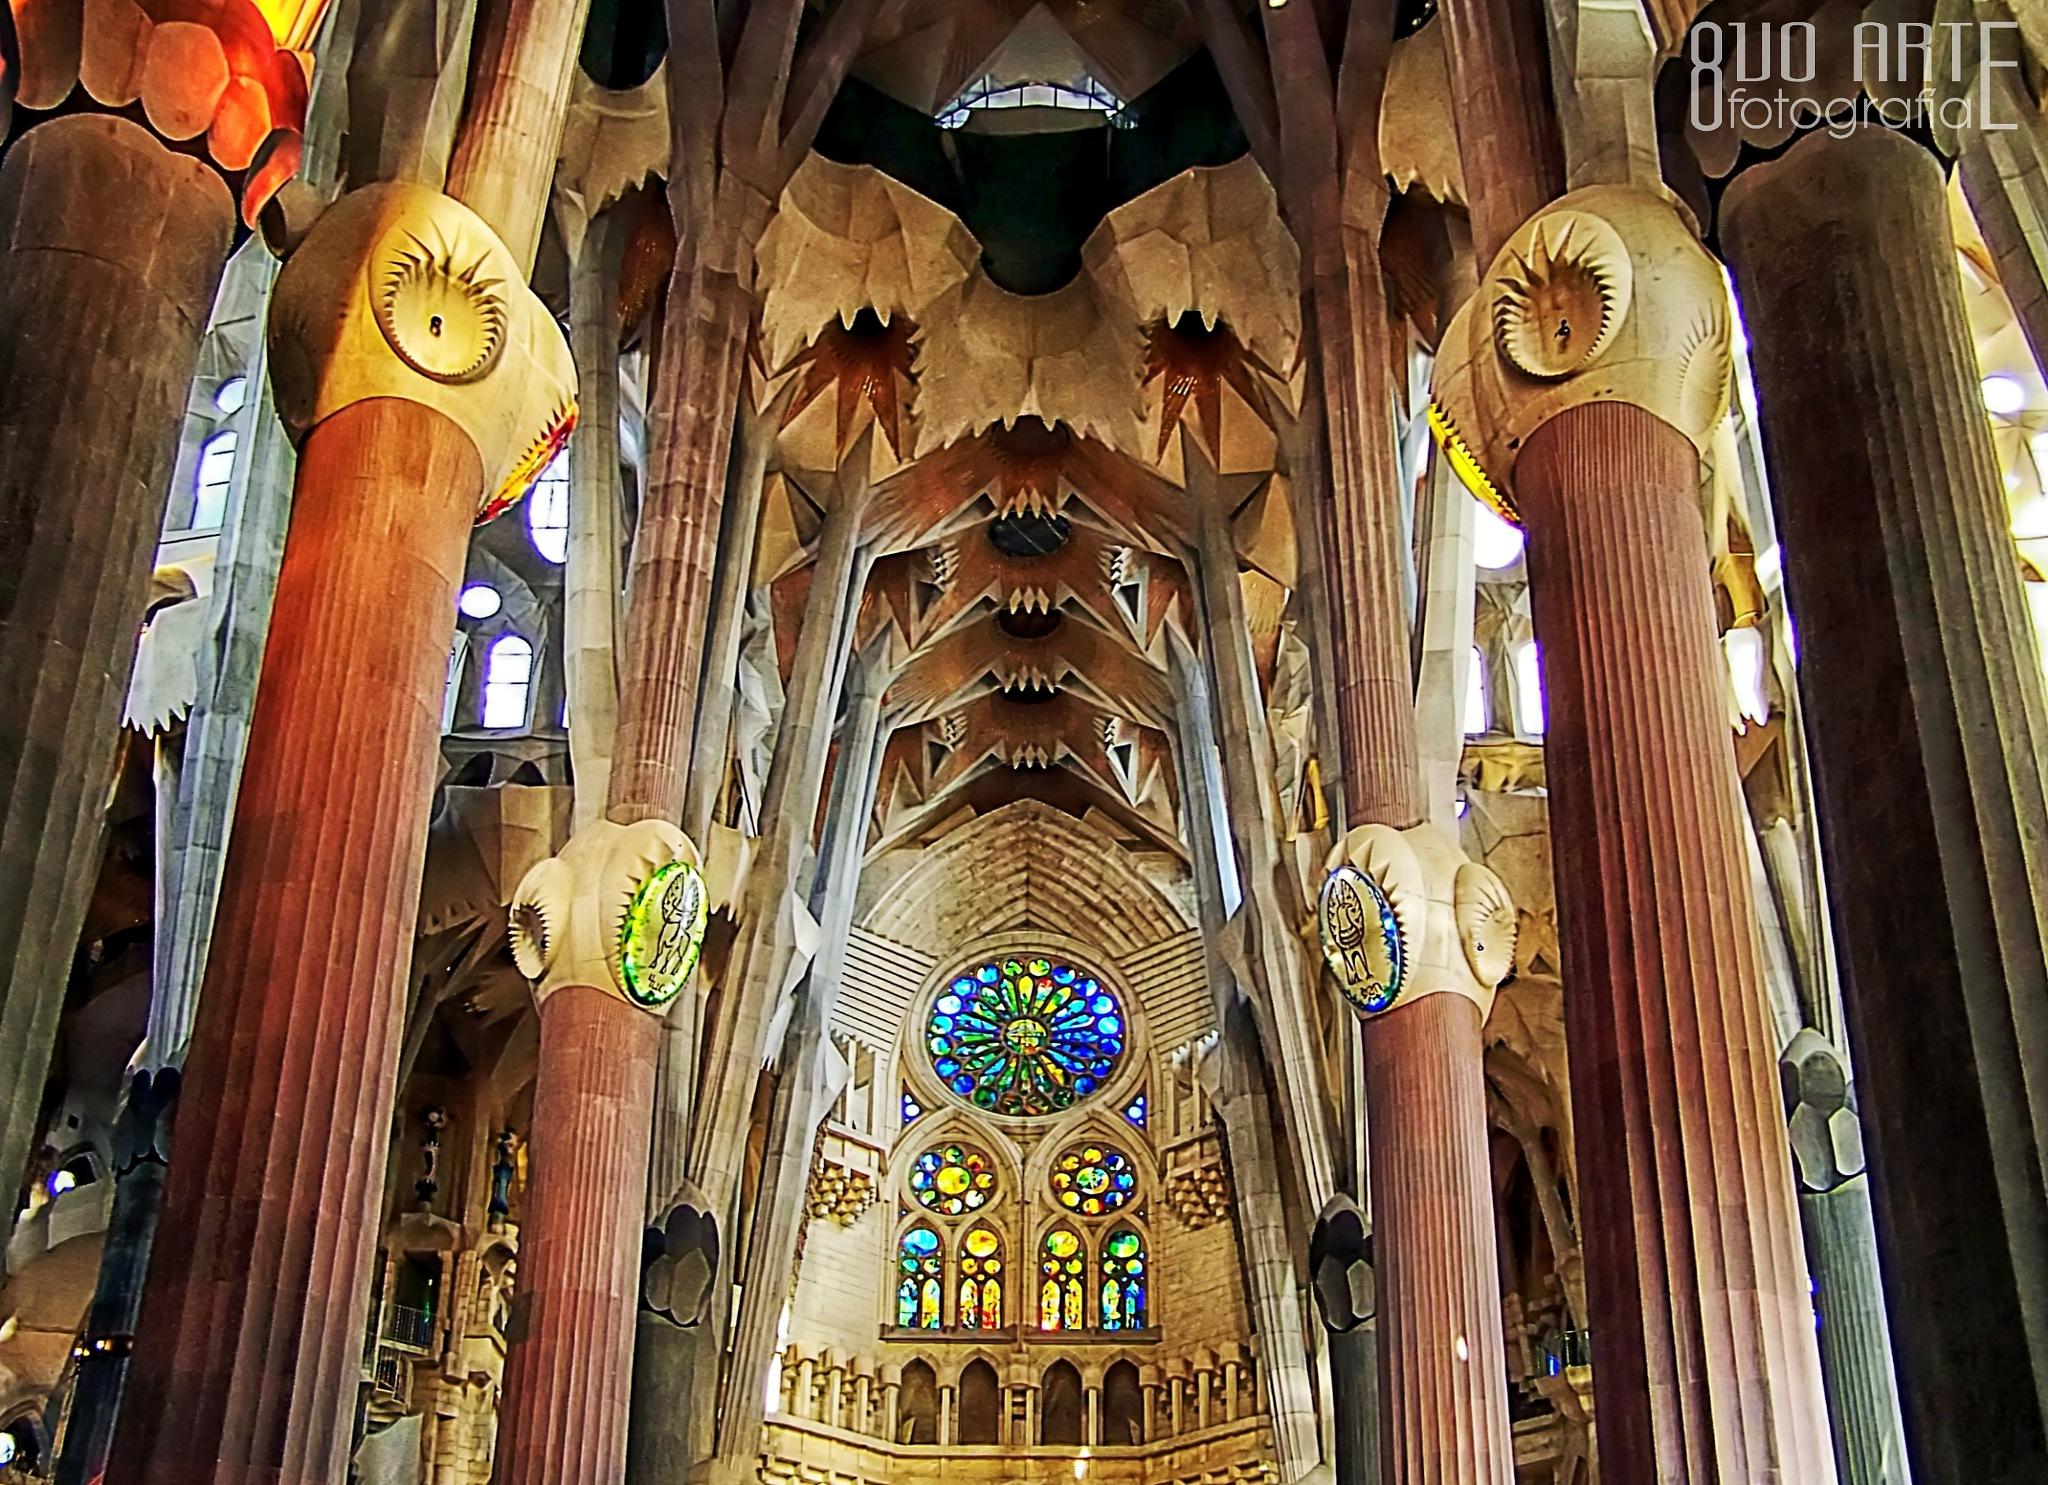 Templo Expiatorio de la Sagrada Familia [Vista interior I] [Indoor view I] by 8vo Arte Fotografia